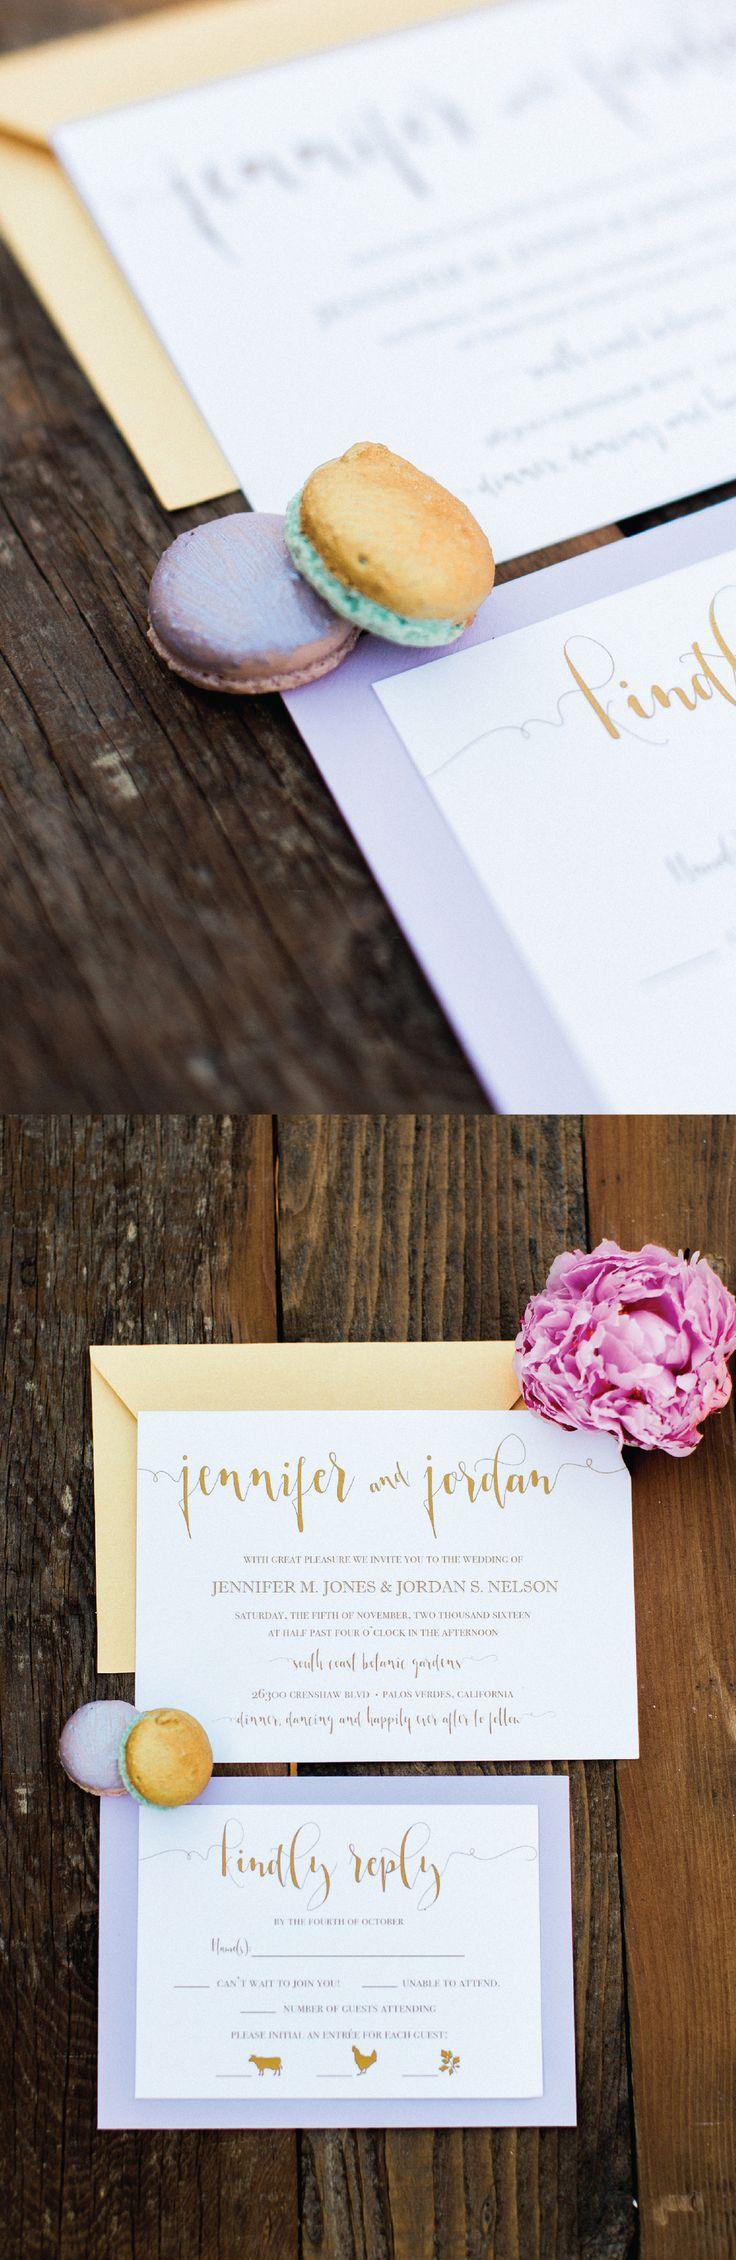 reply to wedding invitation m%0A Lavender Wedding Invitations  Gold Wedding Invitations  Elegant Wedding  Invites  Classic Wedding Invitations